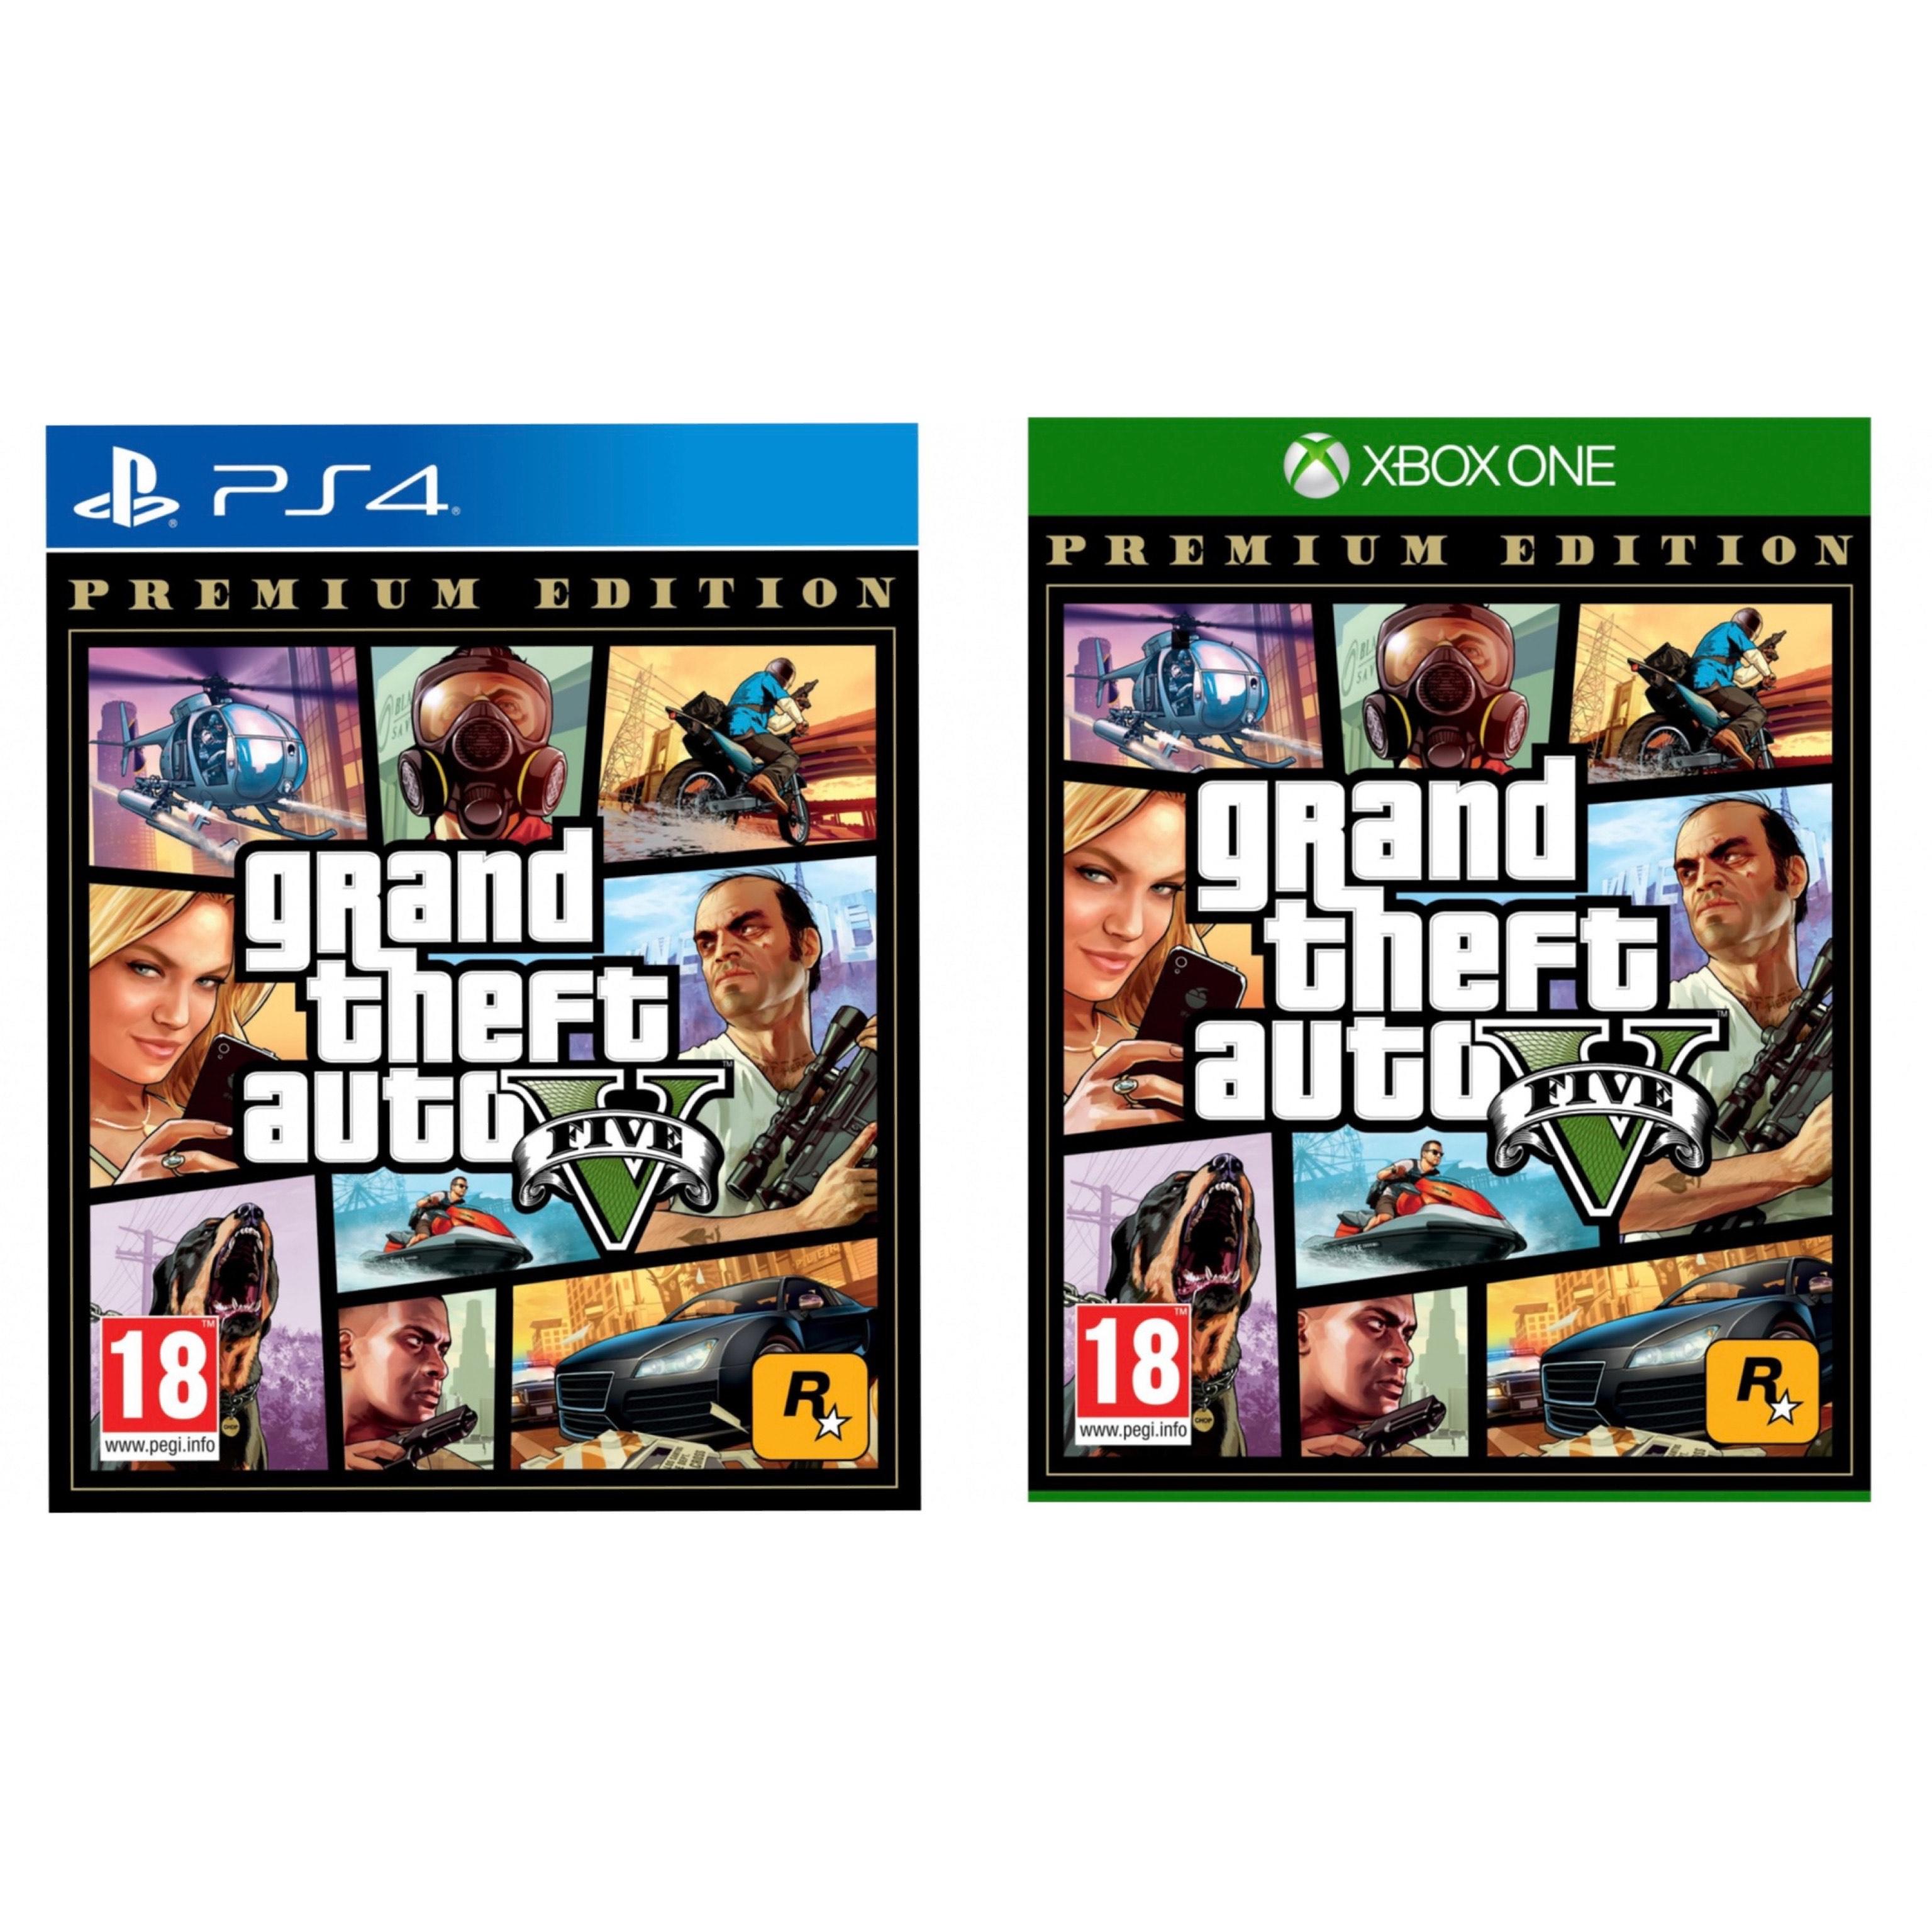 PS4 / Xbox One - GTA V (Grand Theft Auto V) - Premium Edition